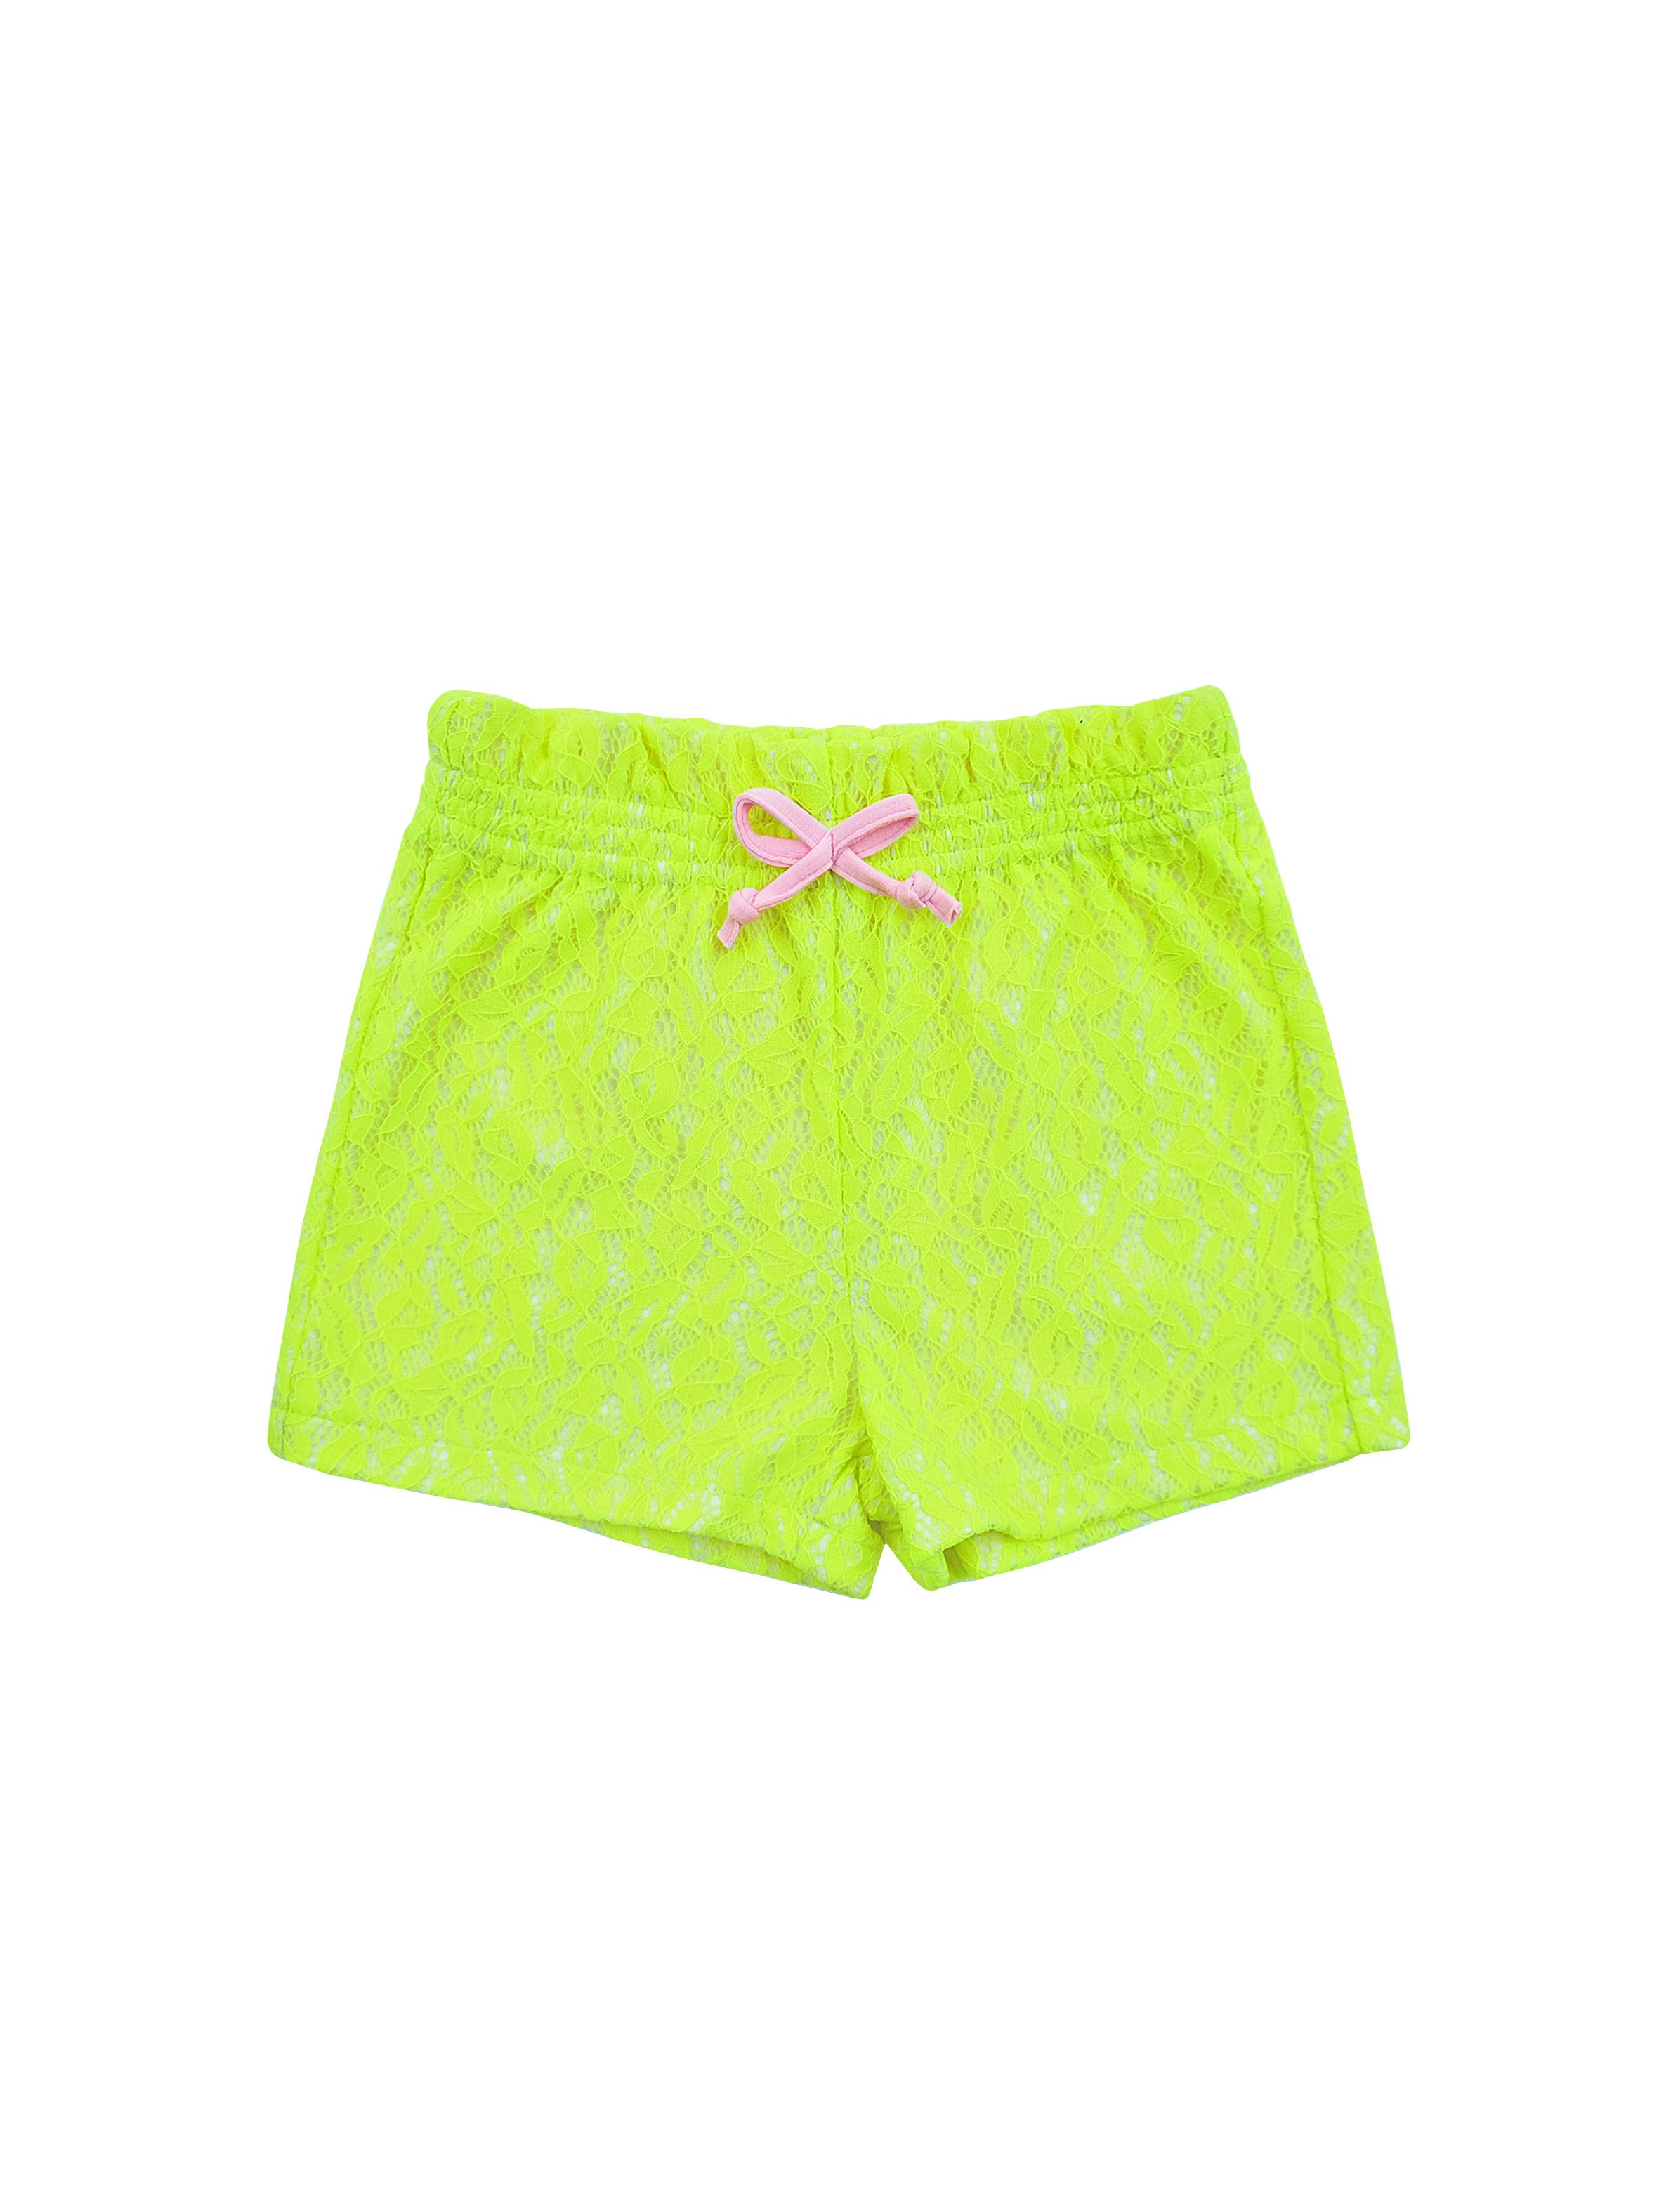 Шорты для девочки Reike Romance green, RKS007SS20ROM